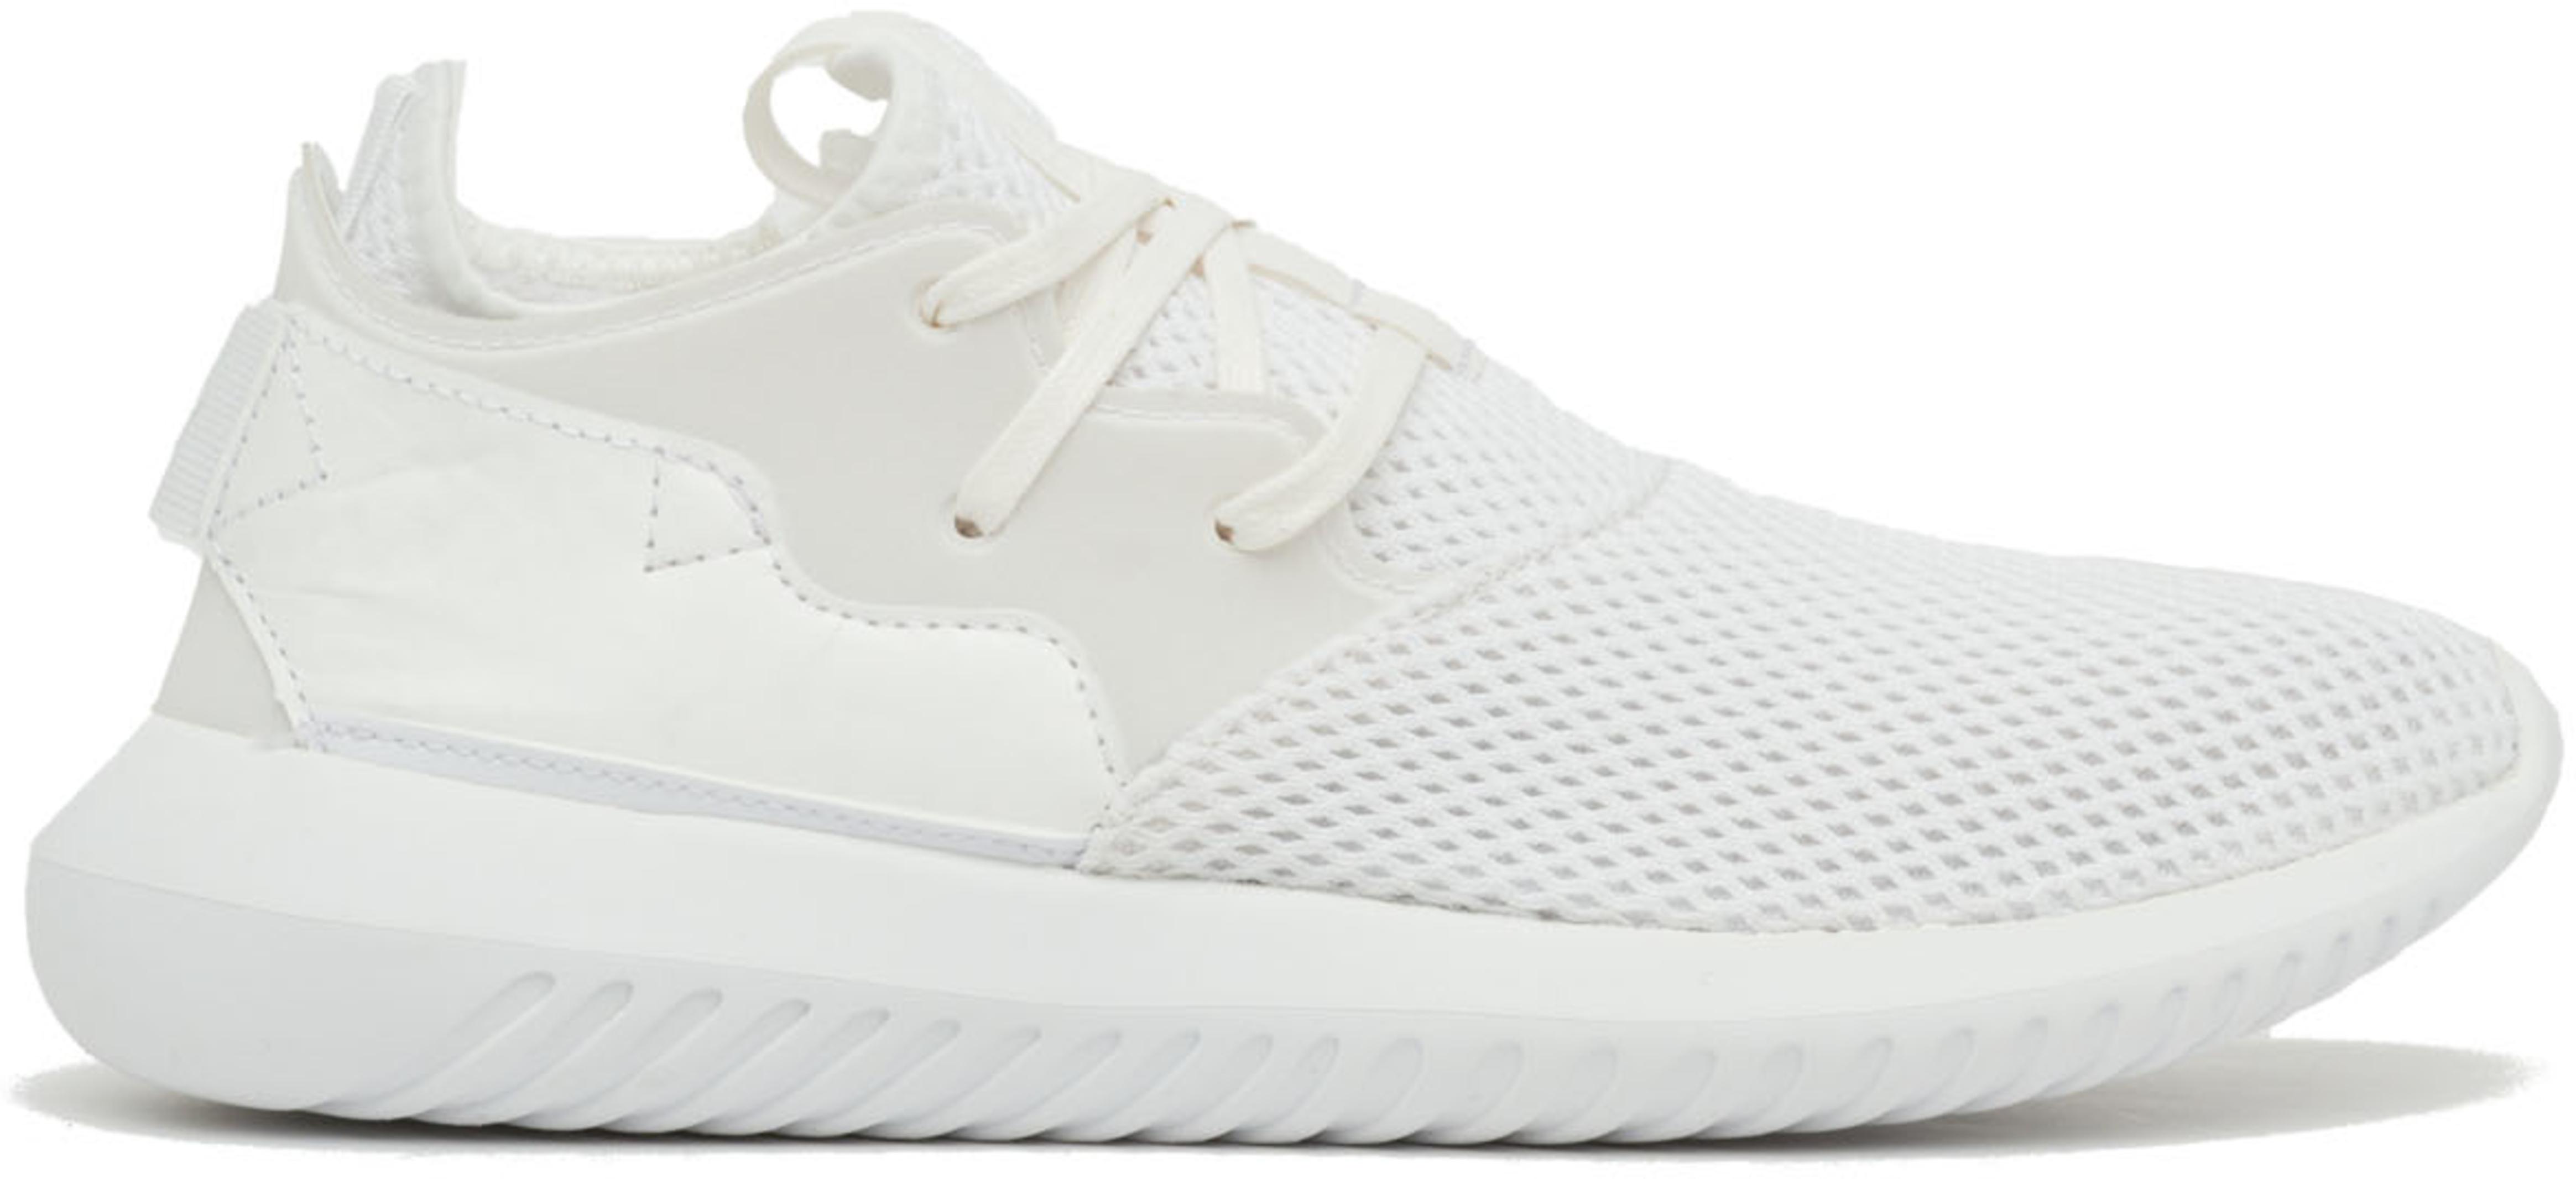 promo code 88472 07e63 adidas Originals - Tubular Entrap - Cloud White/Cloud White/Crystal White